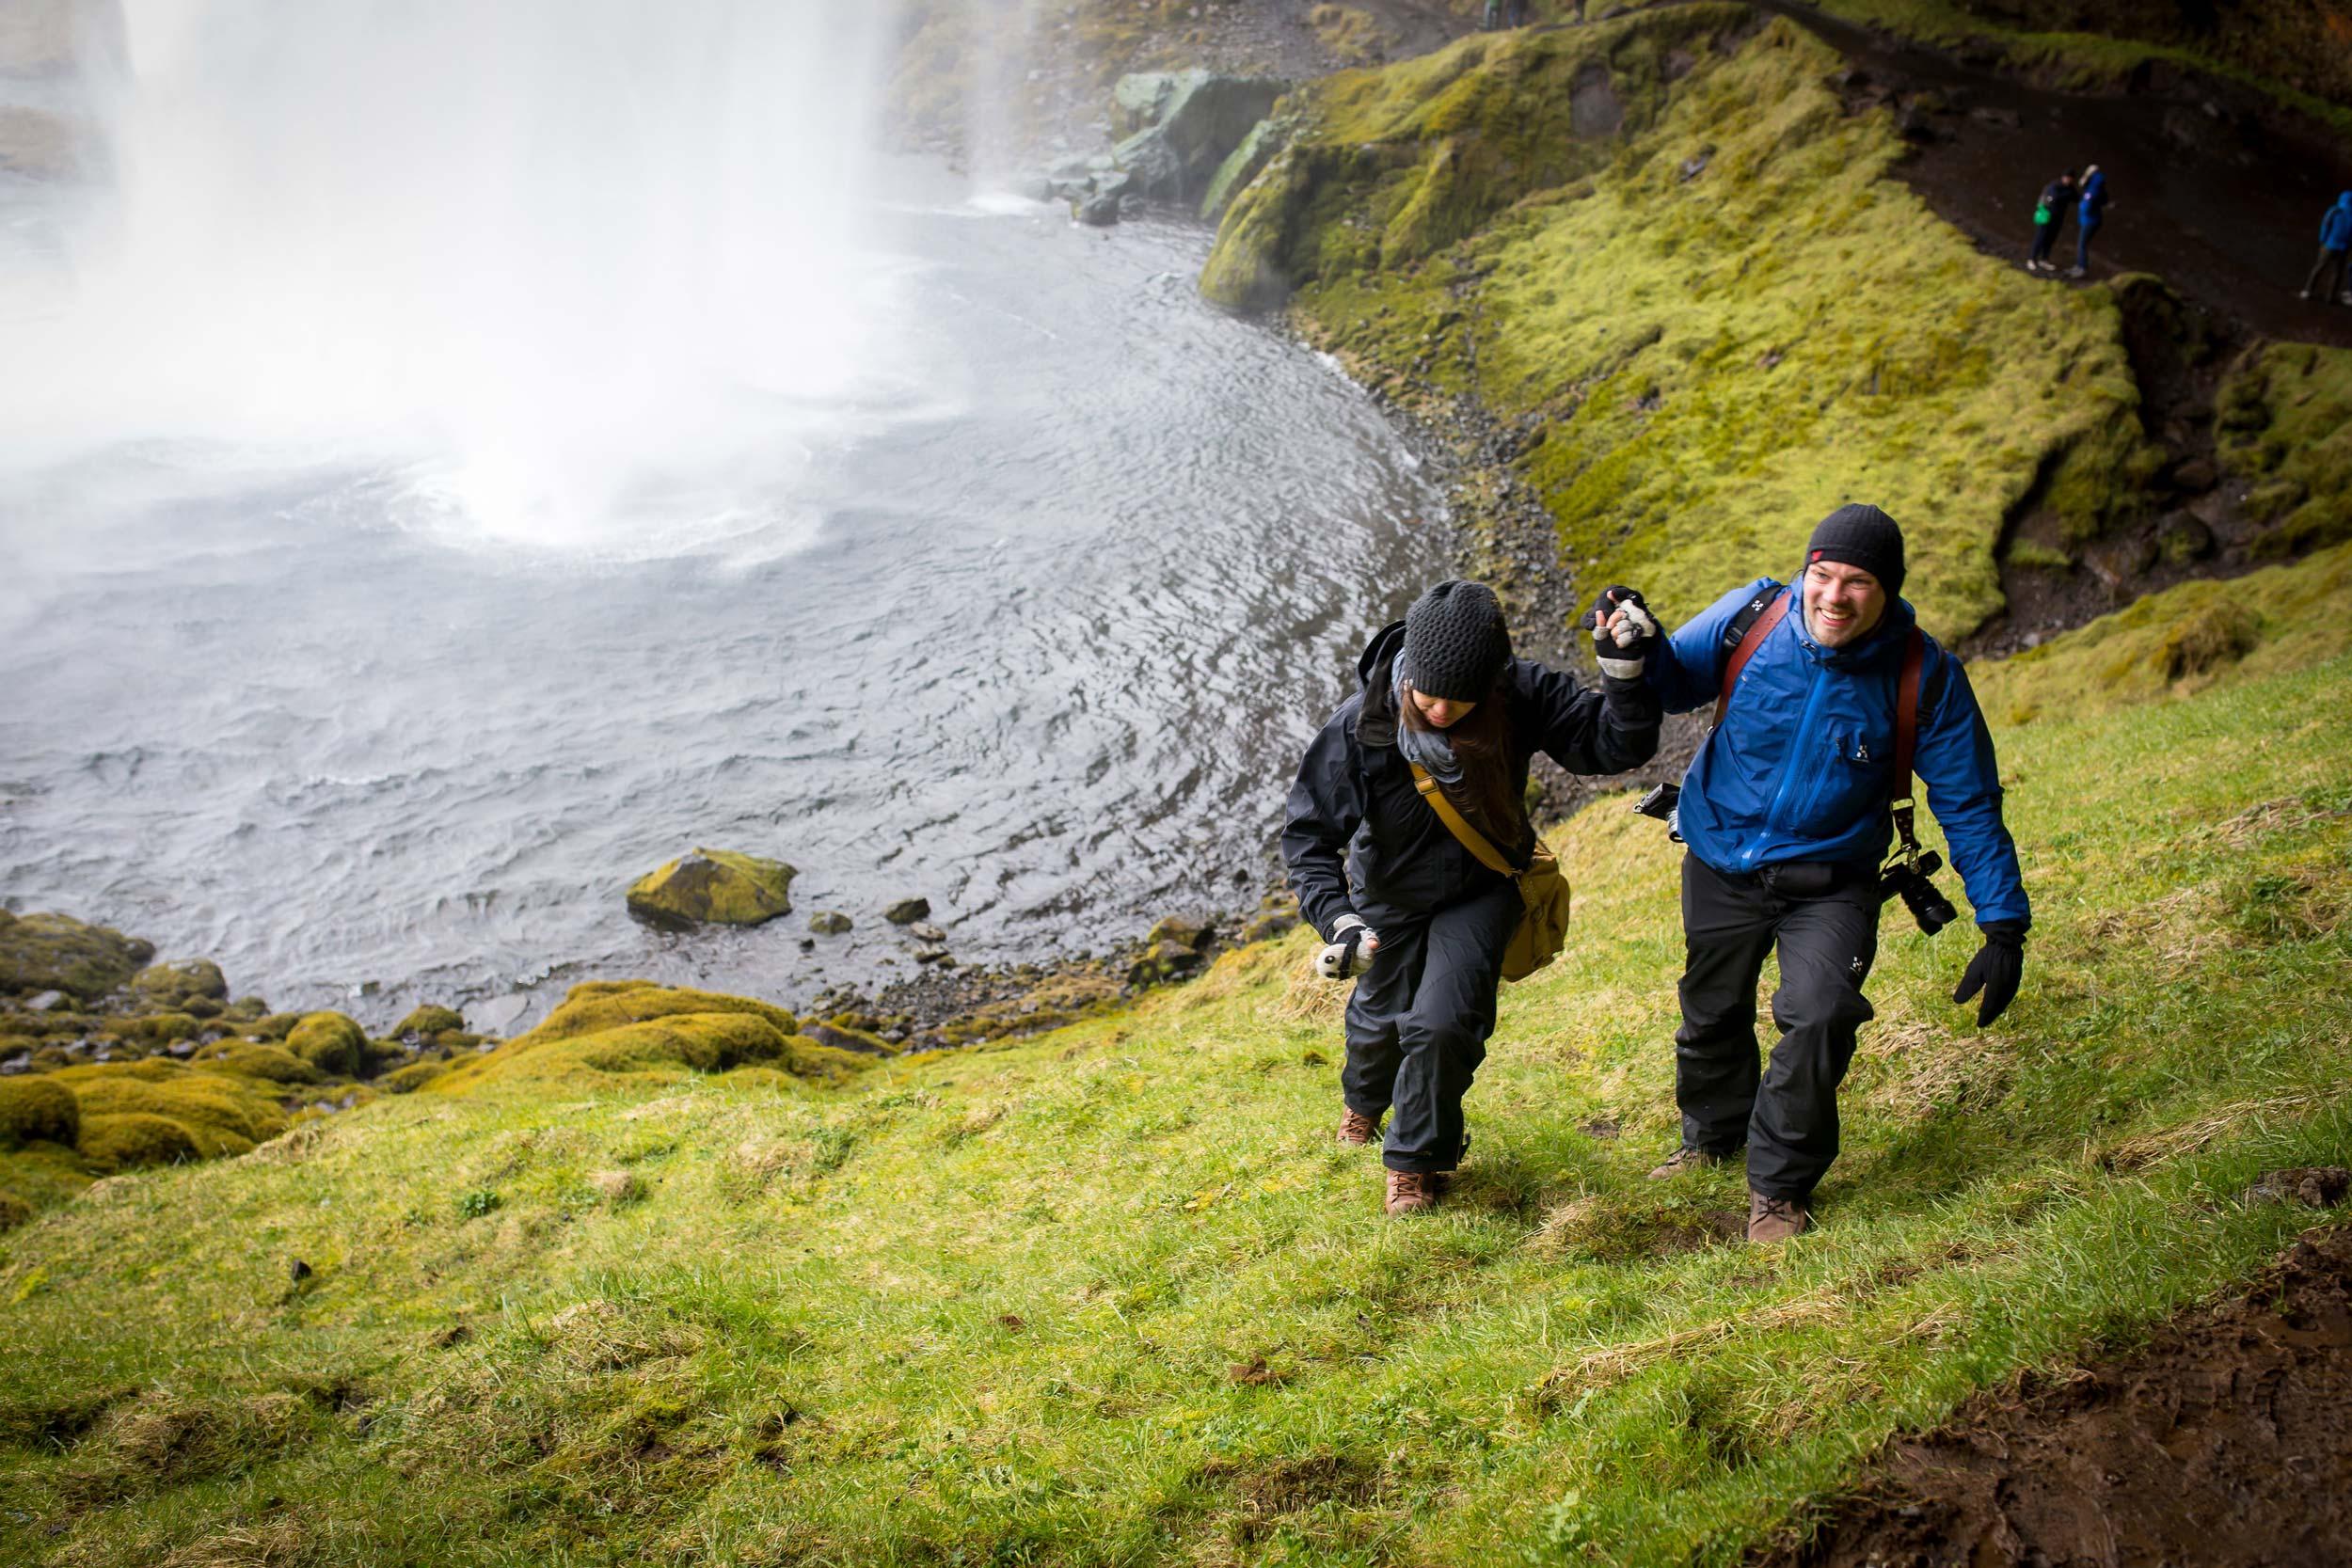 Reportage, Iceland, Divers, Heleen Klop fotografie